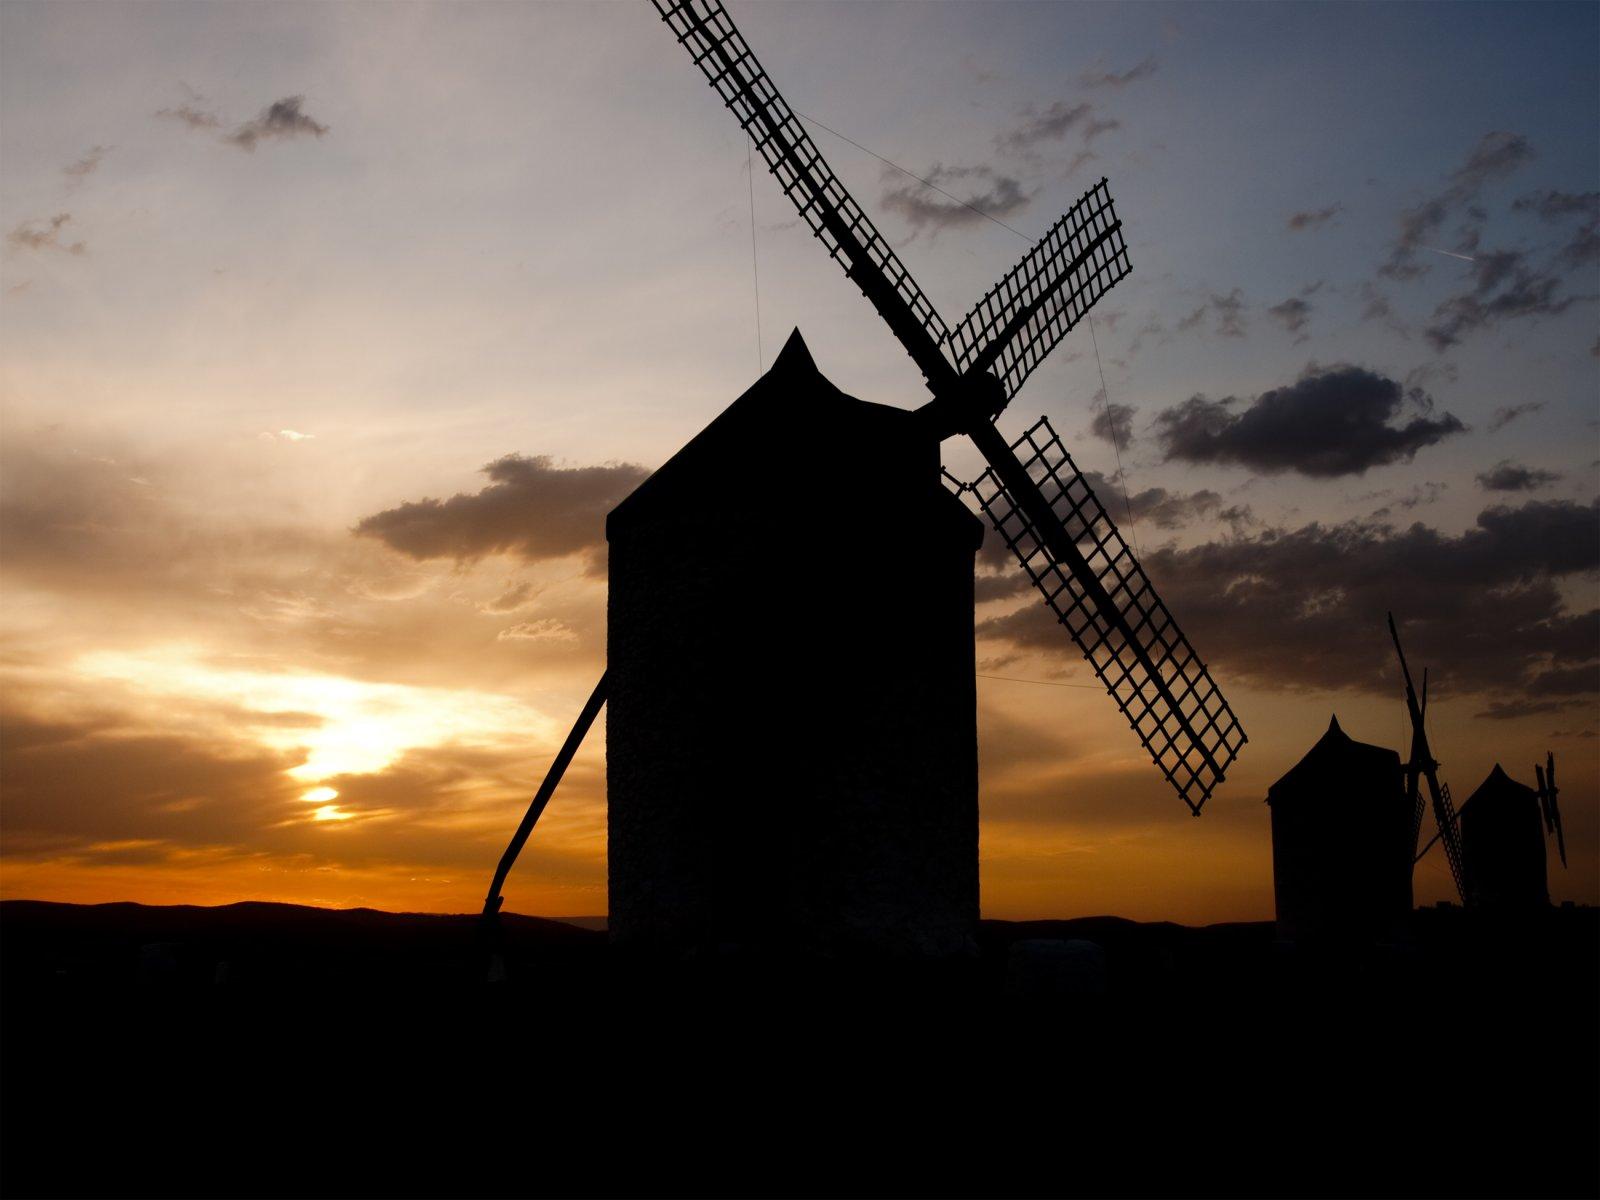 Windmill Silhouette, Consuegra